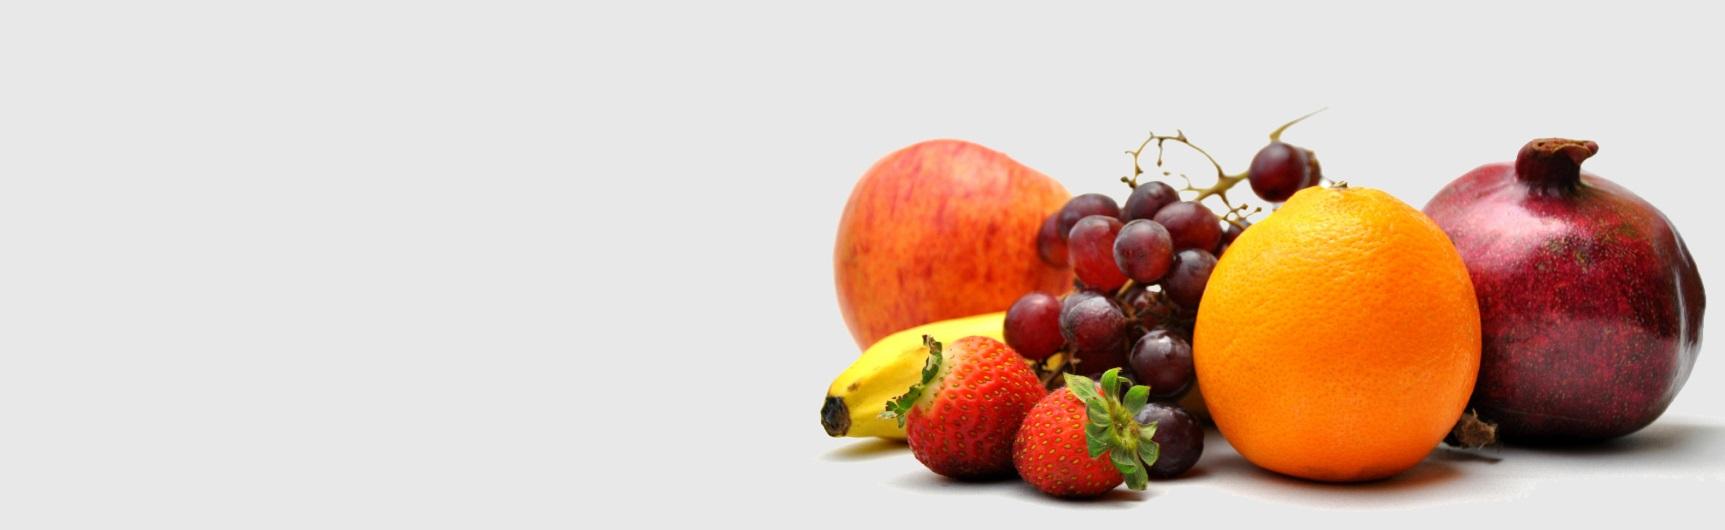 fruit21